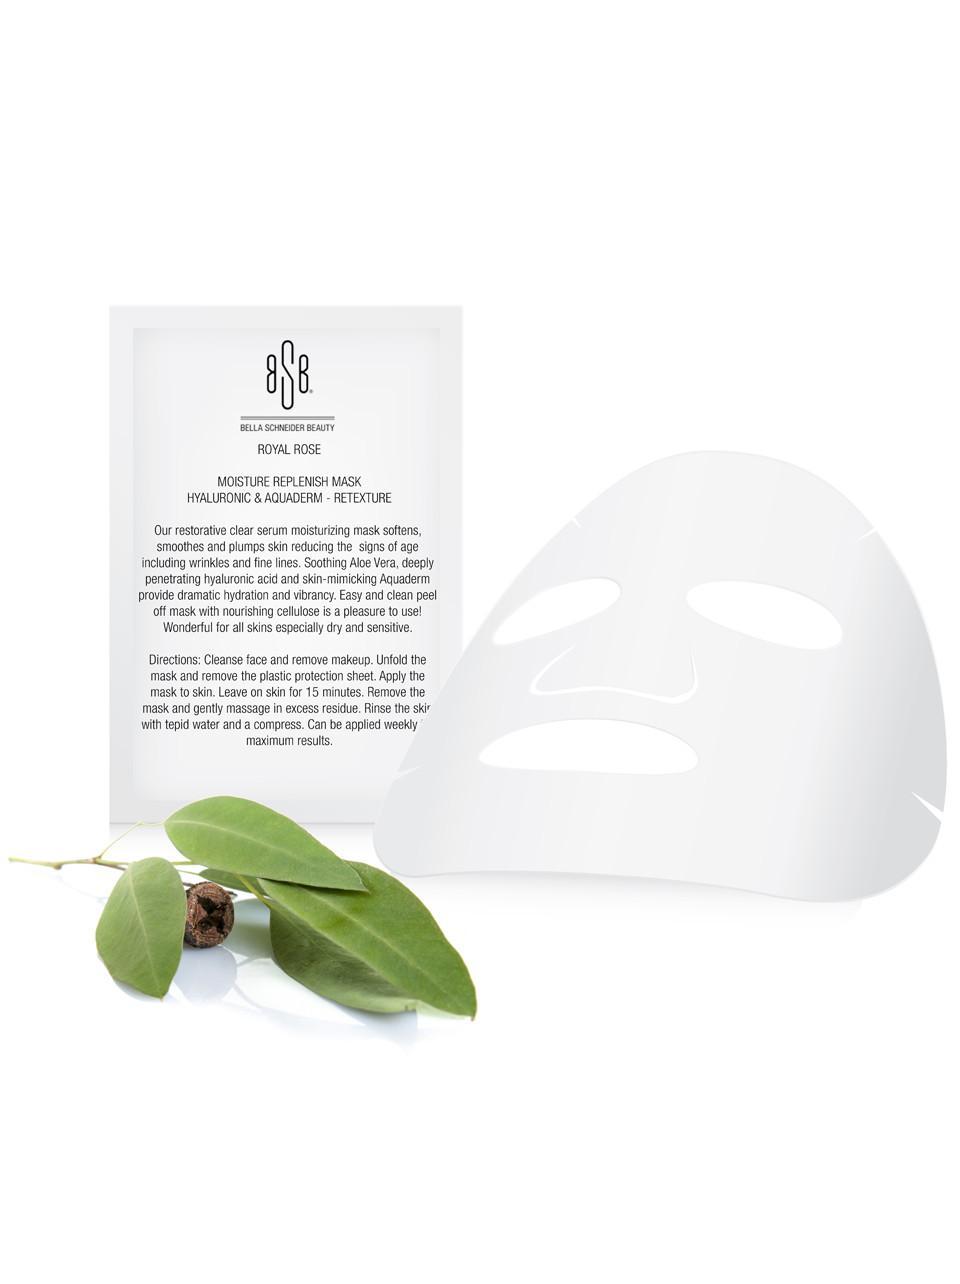 Moisture Replenish Mask Hyaluronic & Aquaderm - Retexture (SET OF 3)